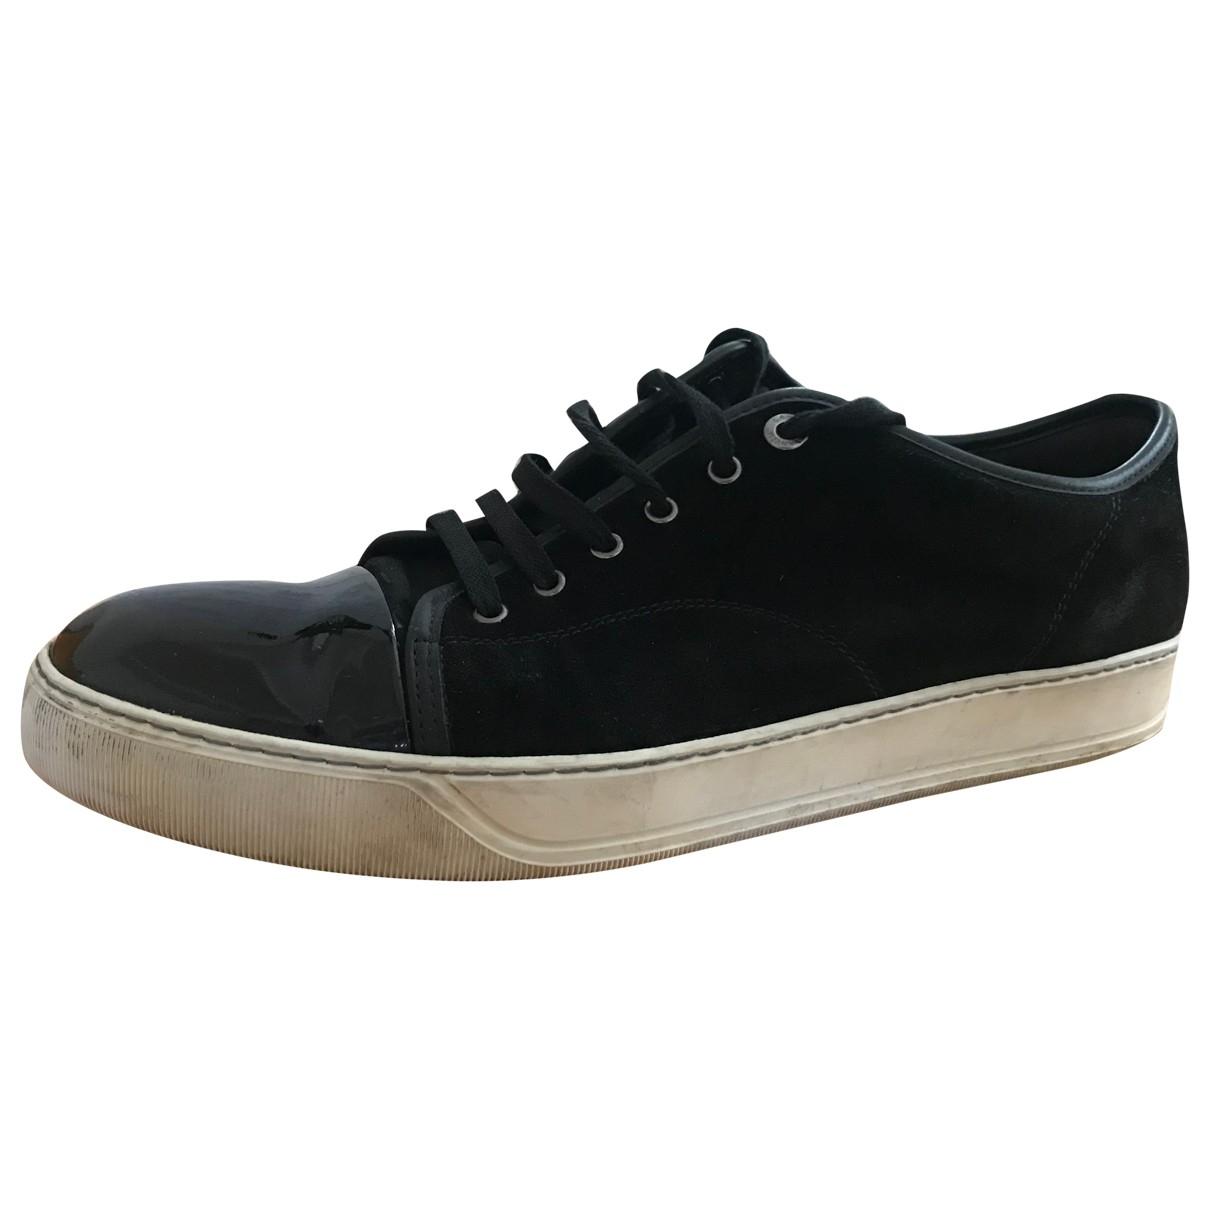 Lanvin \N Sneakers in  Schwarz Leder